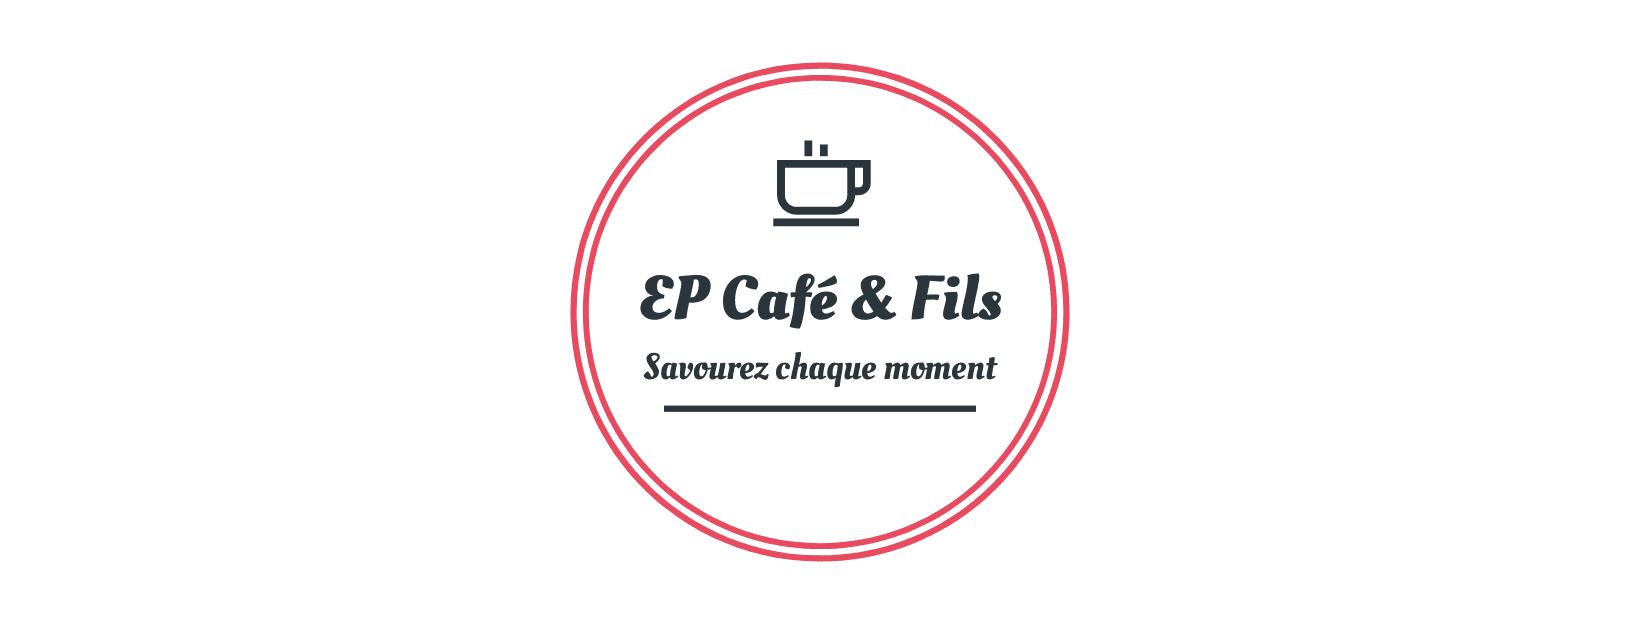 EP Café & Fils